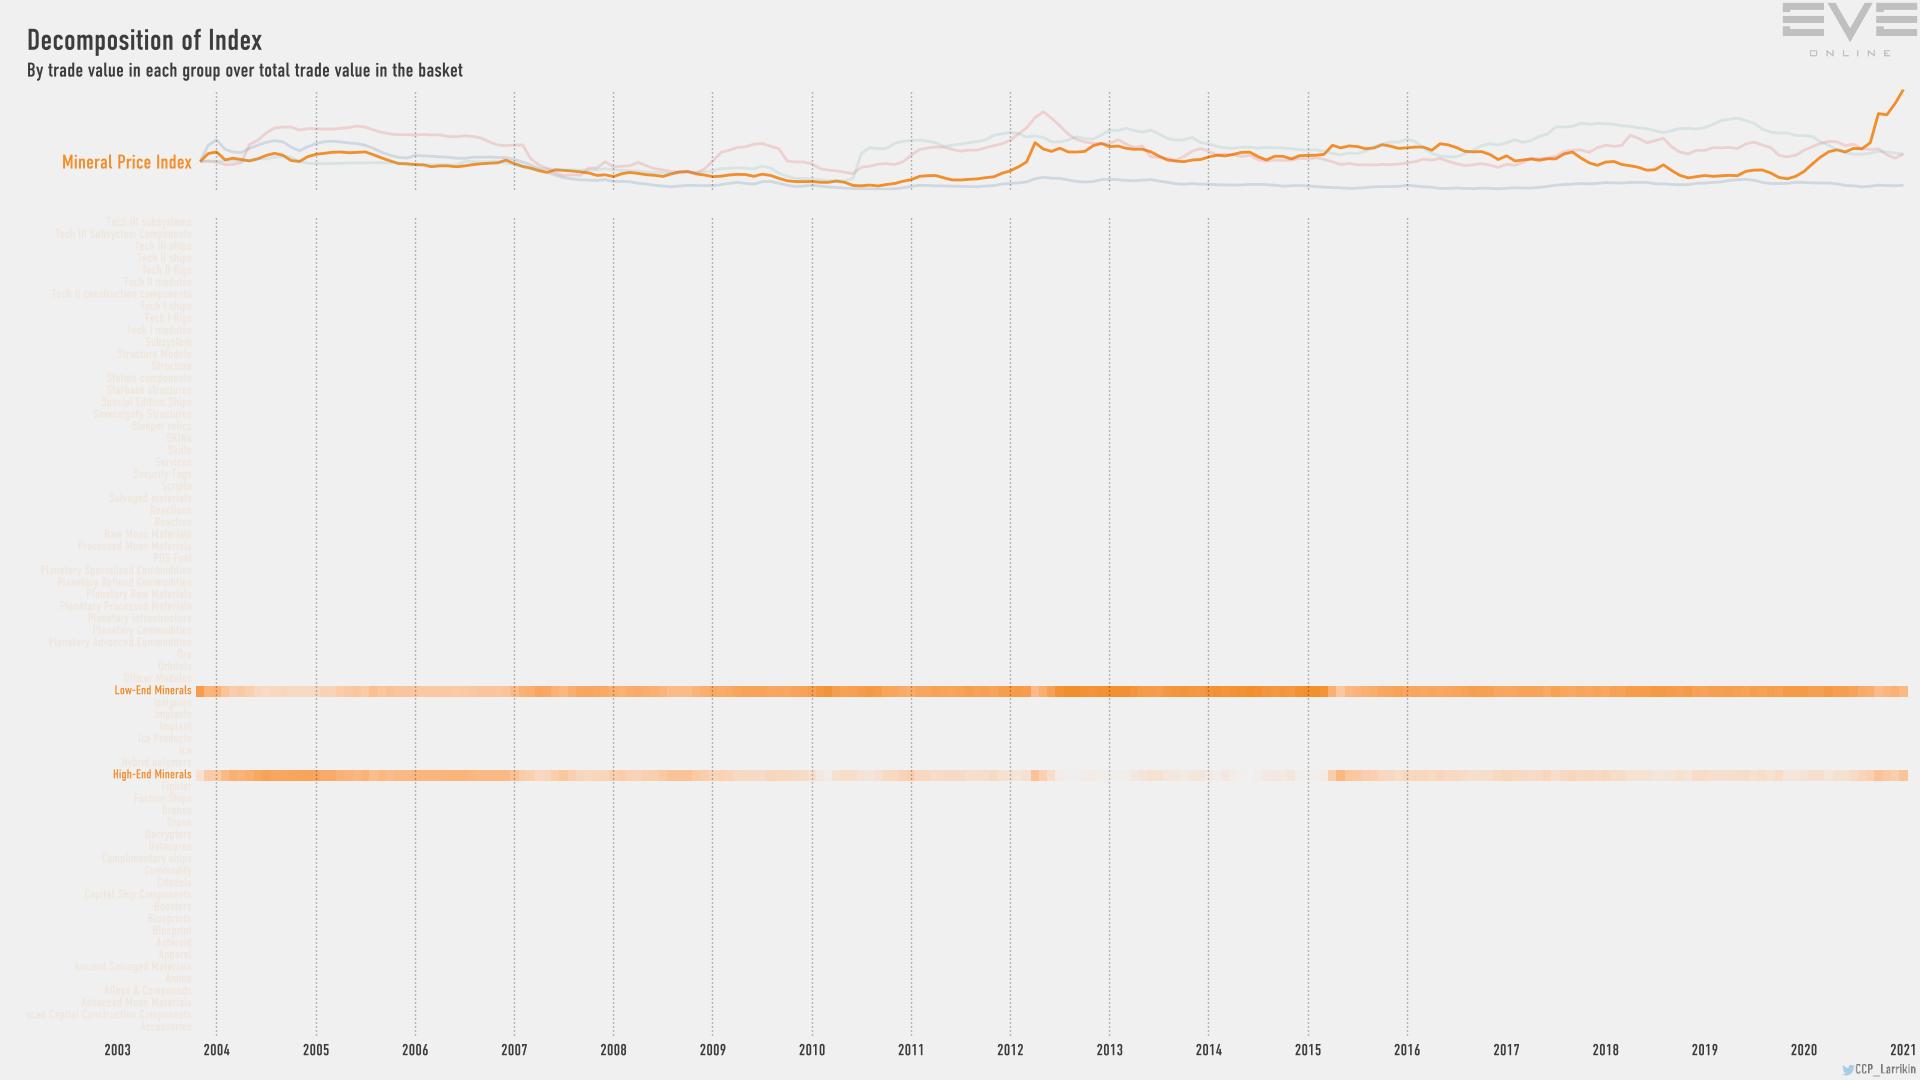 Jan2021 Index Value Decomp Mineral Price Index